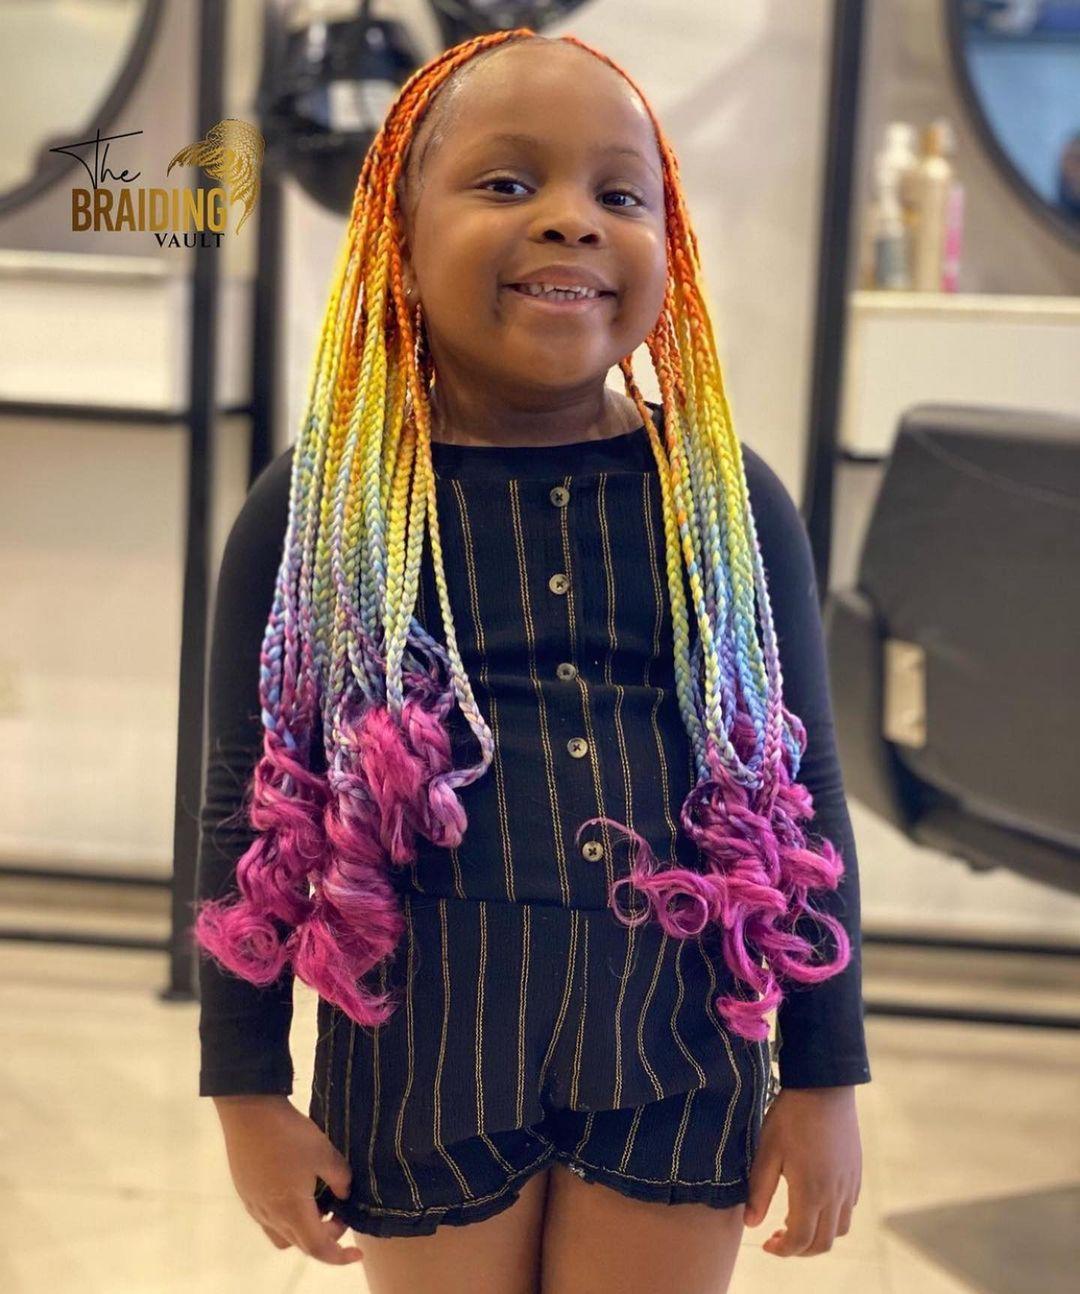 Rainbow braids for a cutie